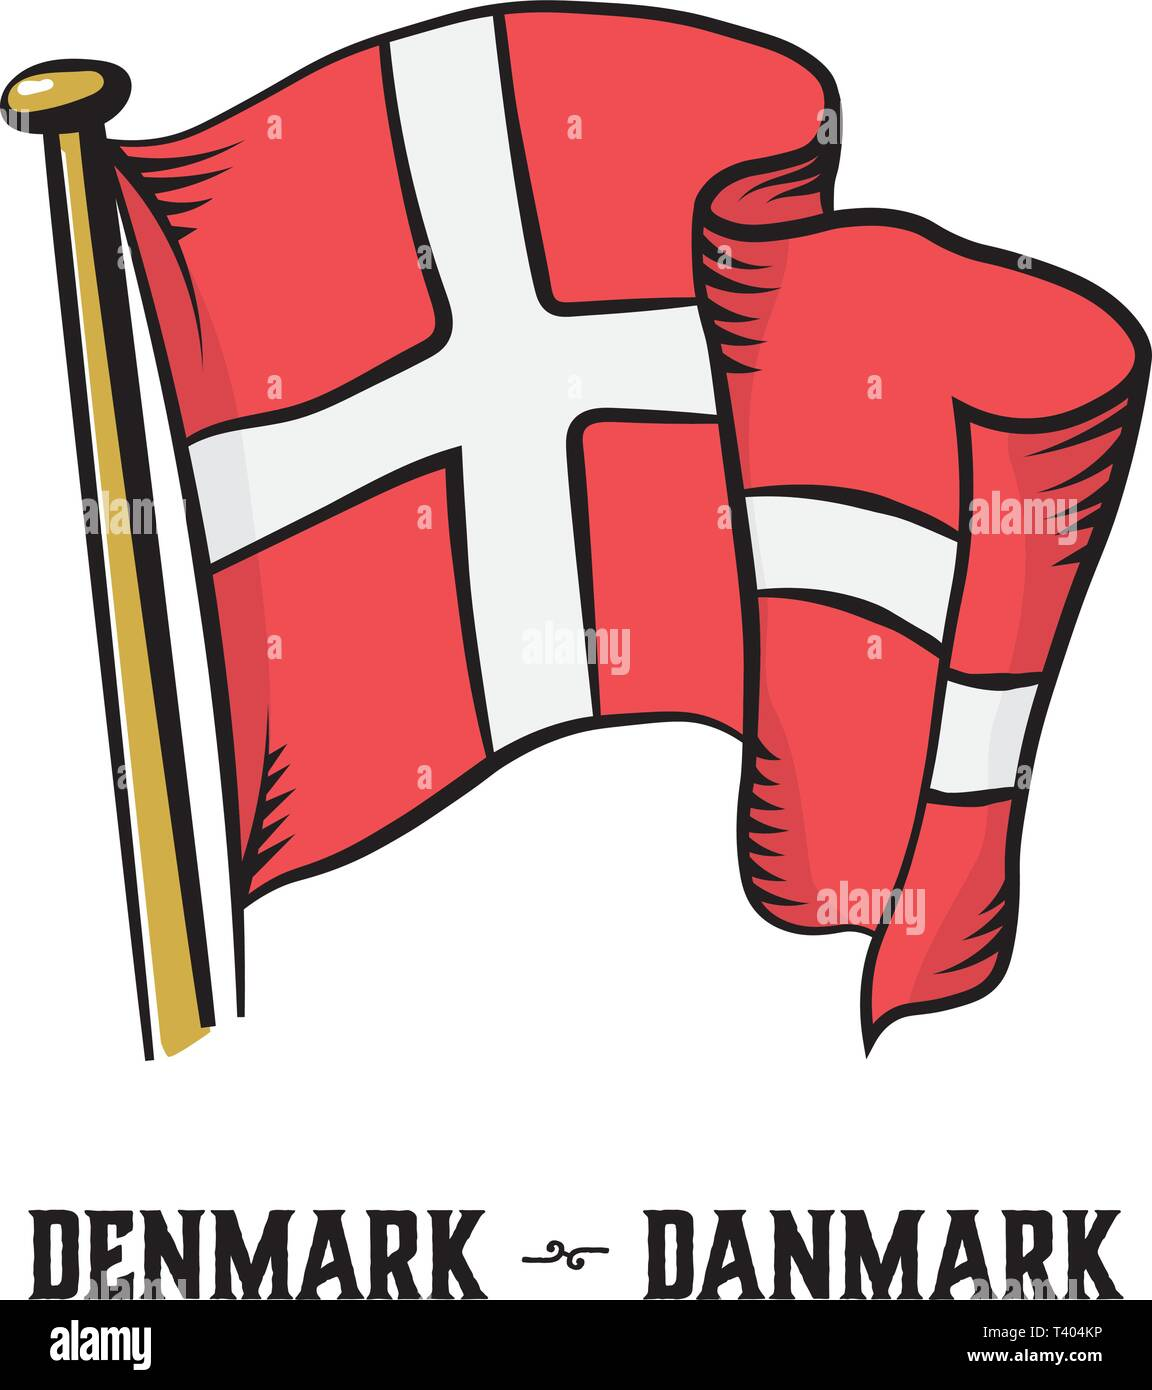 Vintage engraving style Denmark flag vector illustration - Stock Vector